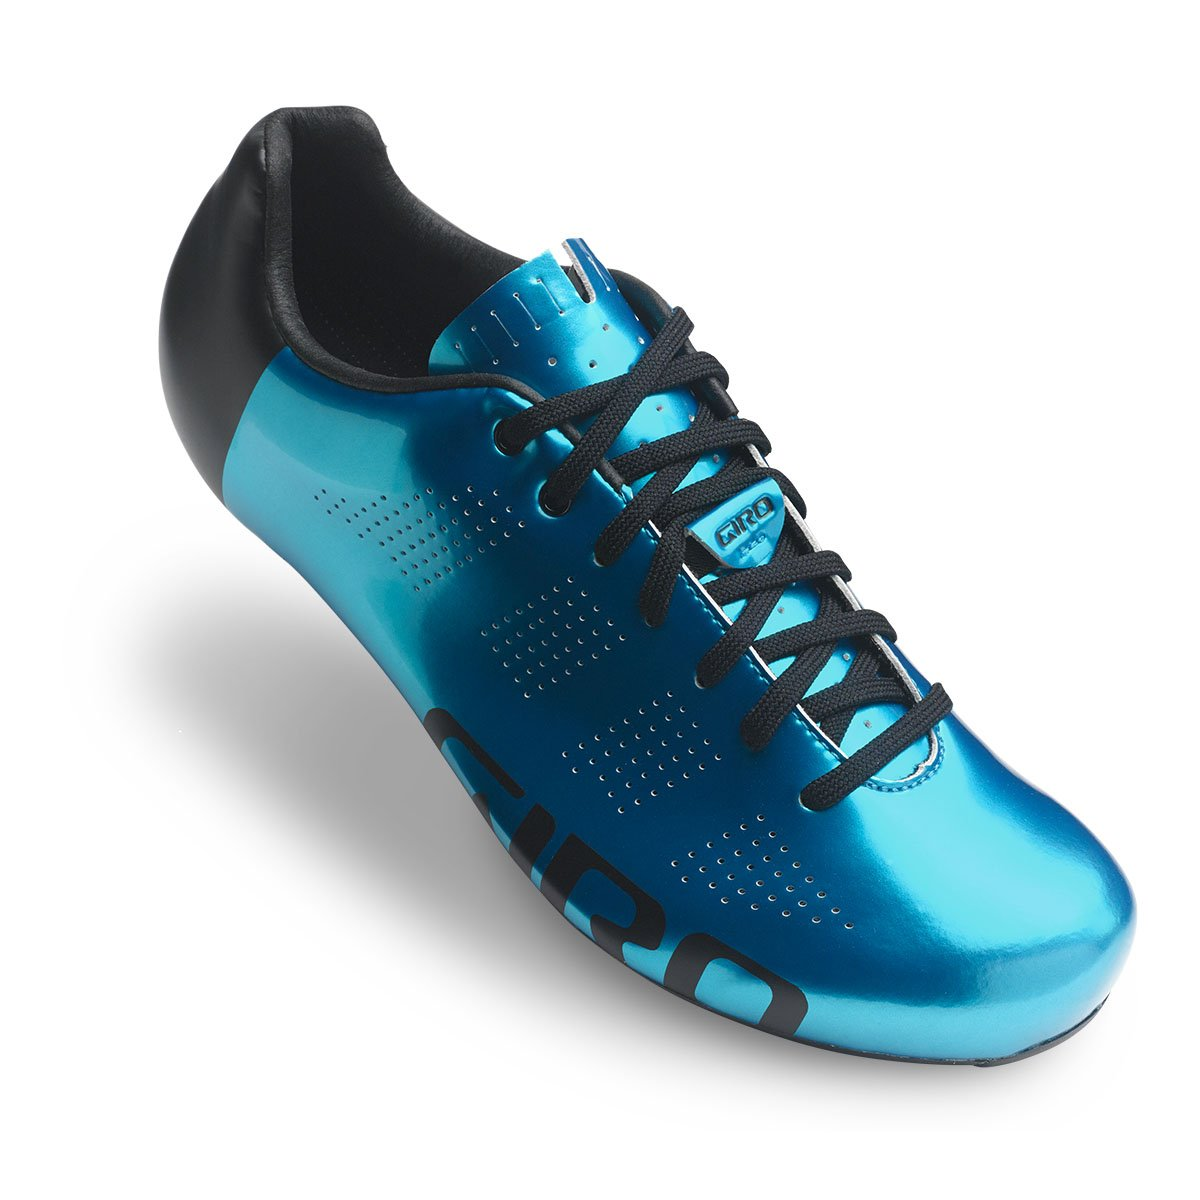 Giro Empire ACC バイクシューズ メンズ B01M0F0B4A 40 EU|Blue Steel/Matte Black Blue Steel/Matte Black 40 EU